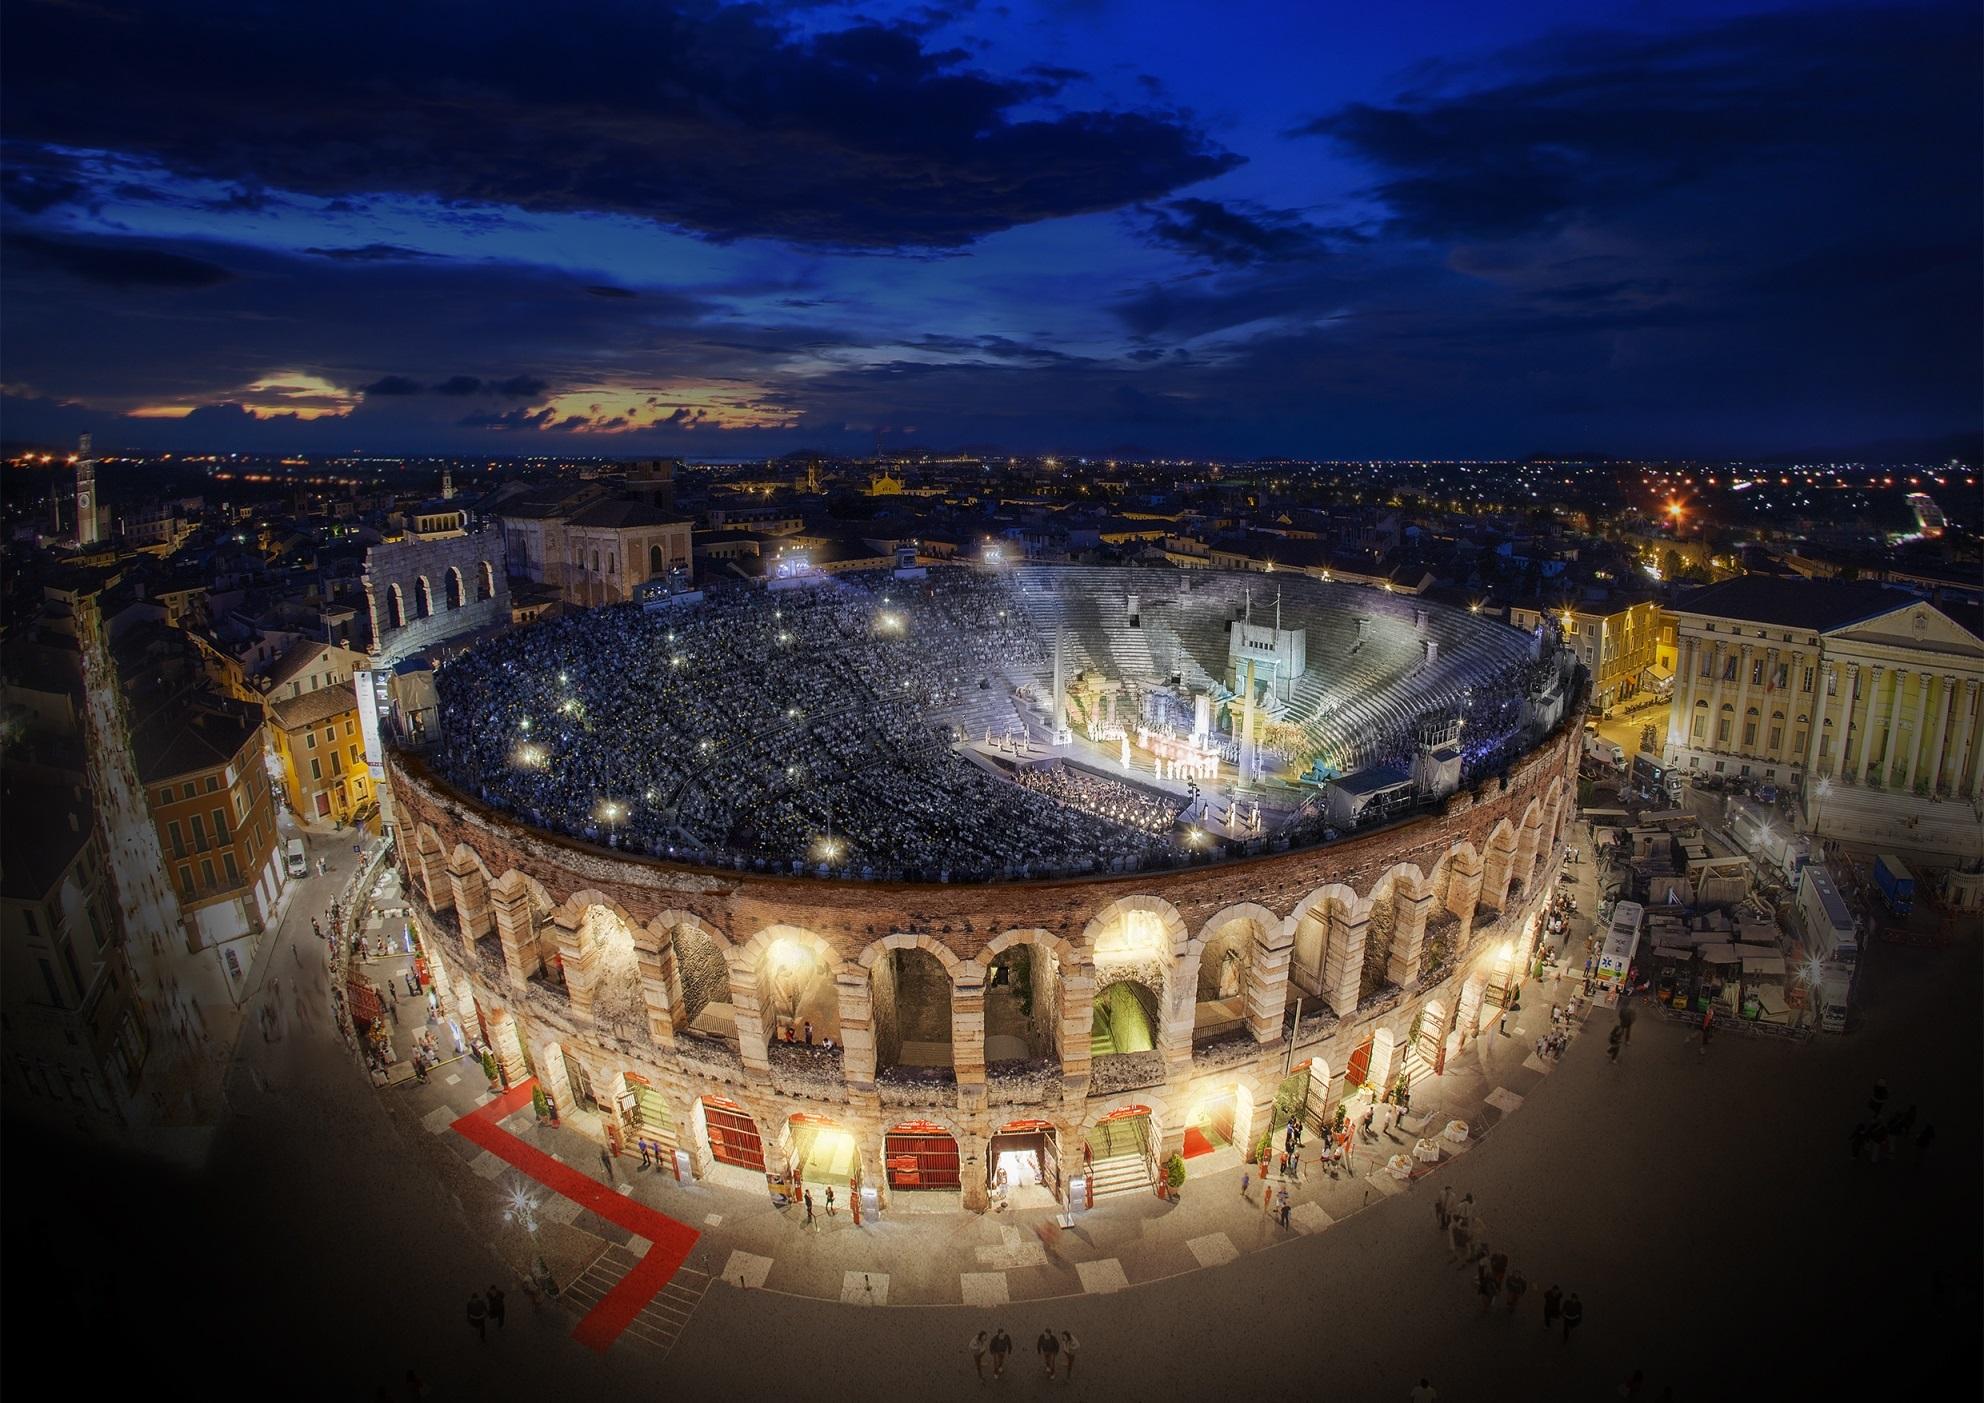 Calendario Arena Verona 2020.Aperte Le Vendite Per L Arena Di Verona Opera Festival 2020